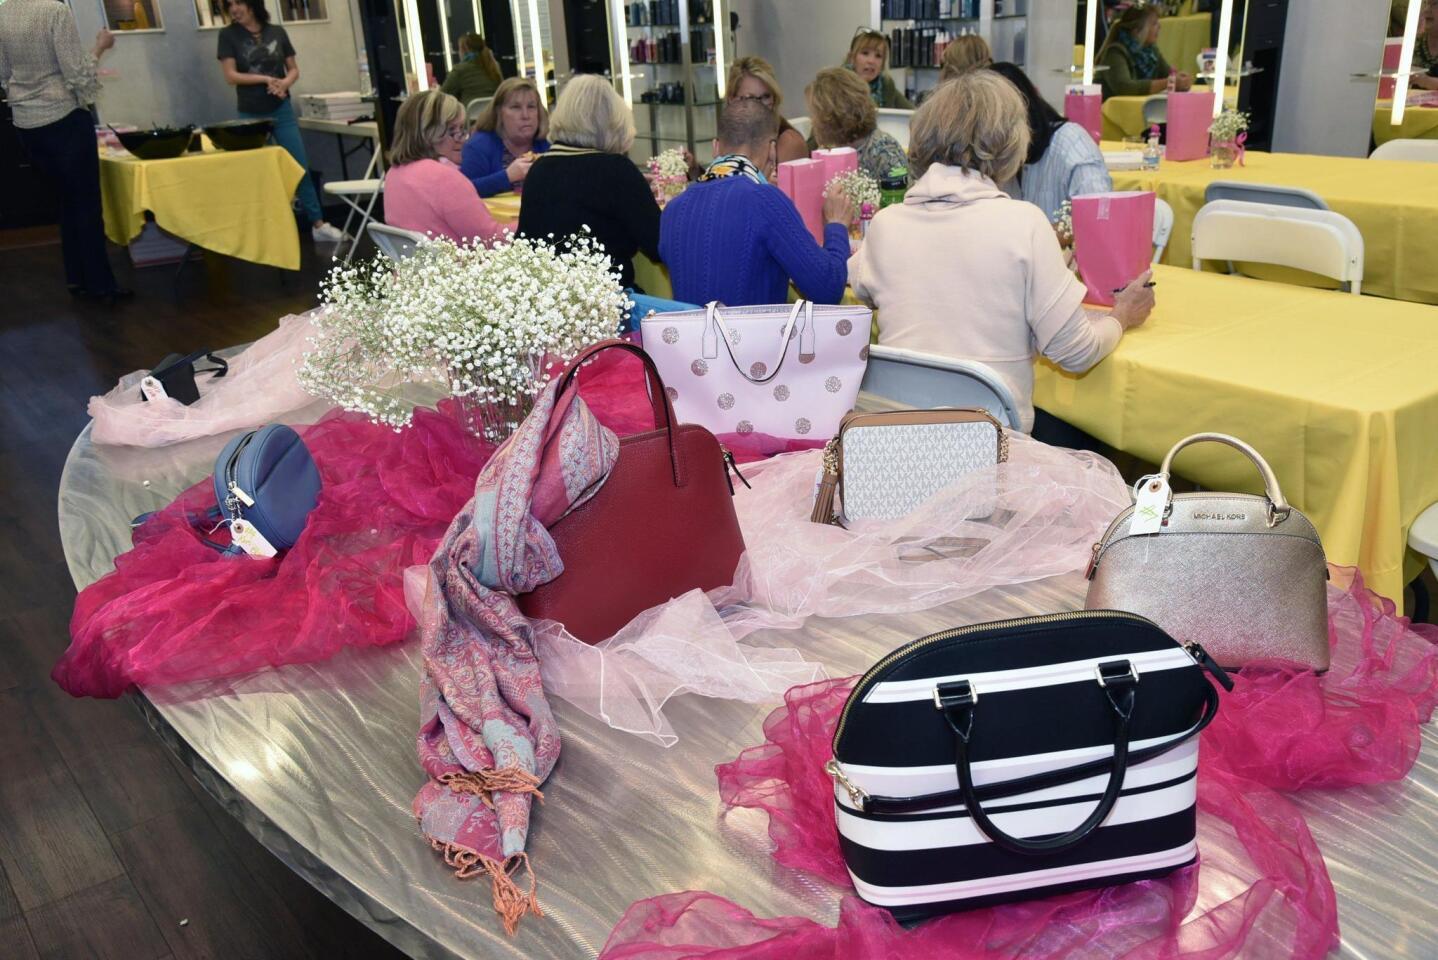 Purse Bingo event benefits Shades of Pink Foundation California's grant program